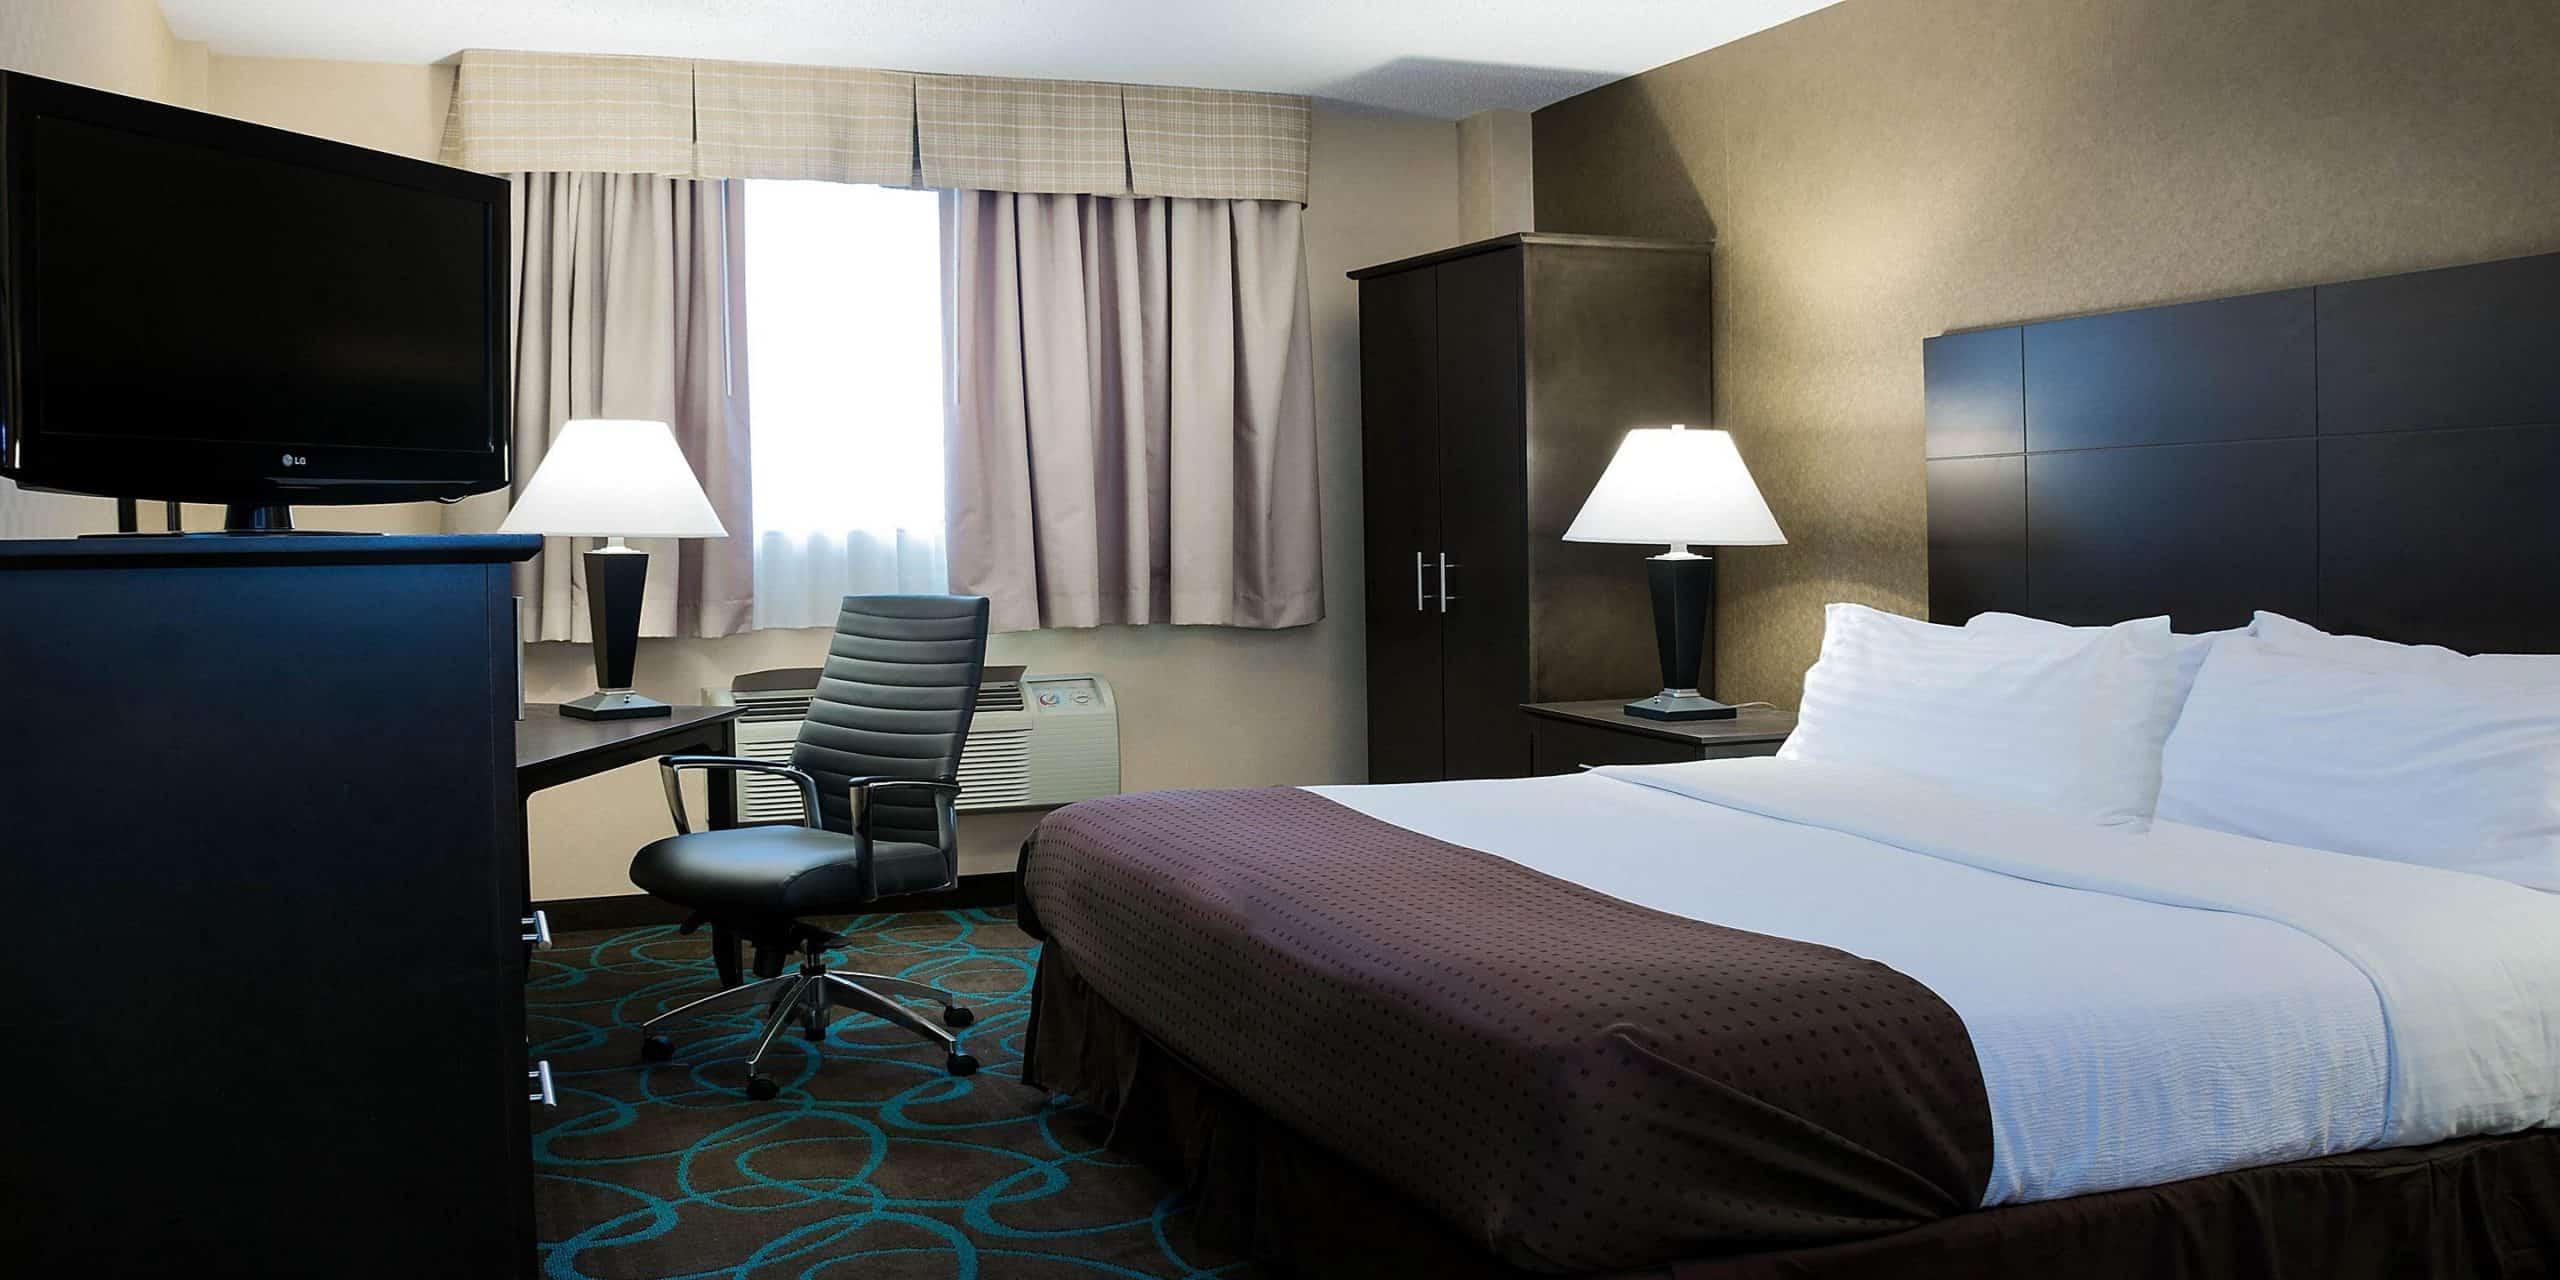 Holiday Inn: Niagara Falls-Scenic Downtown